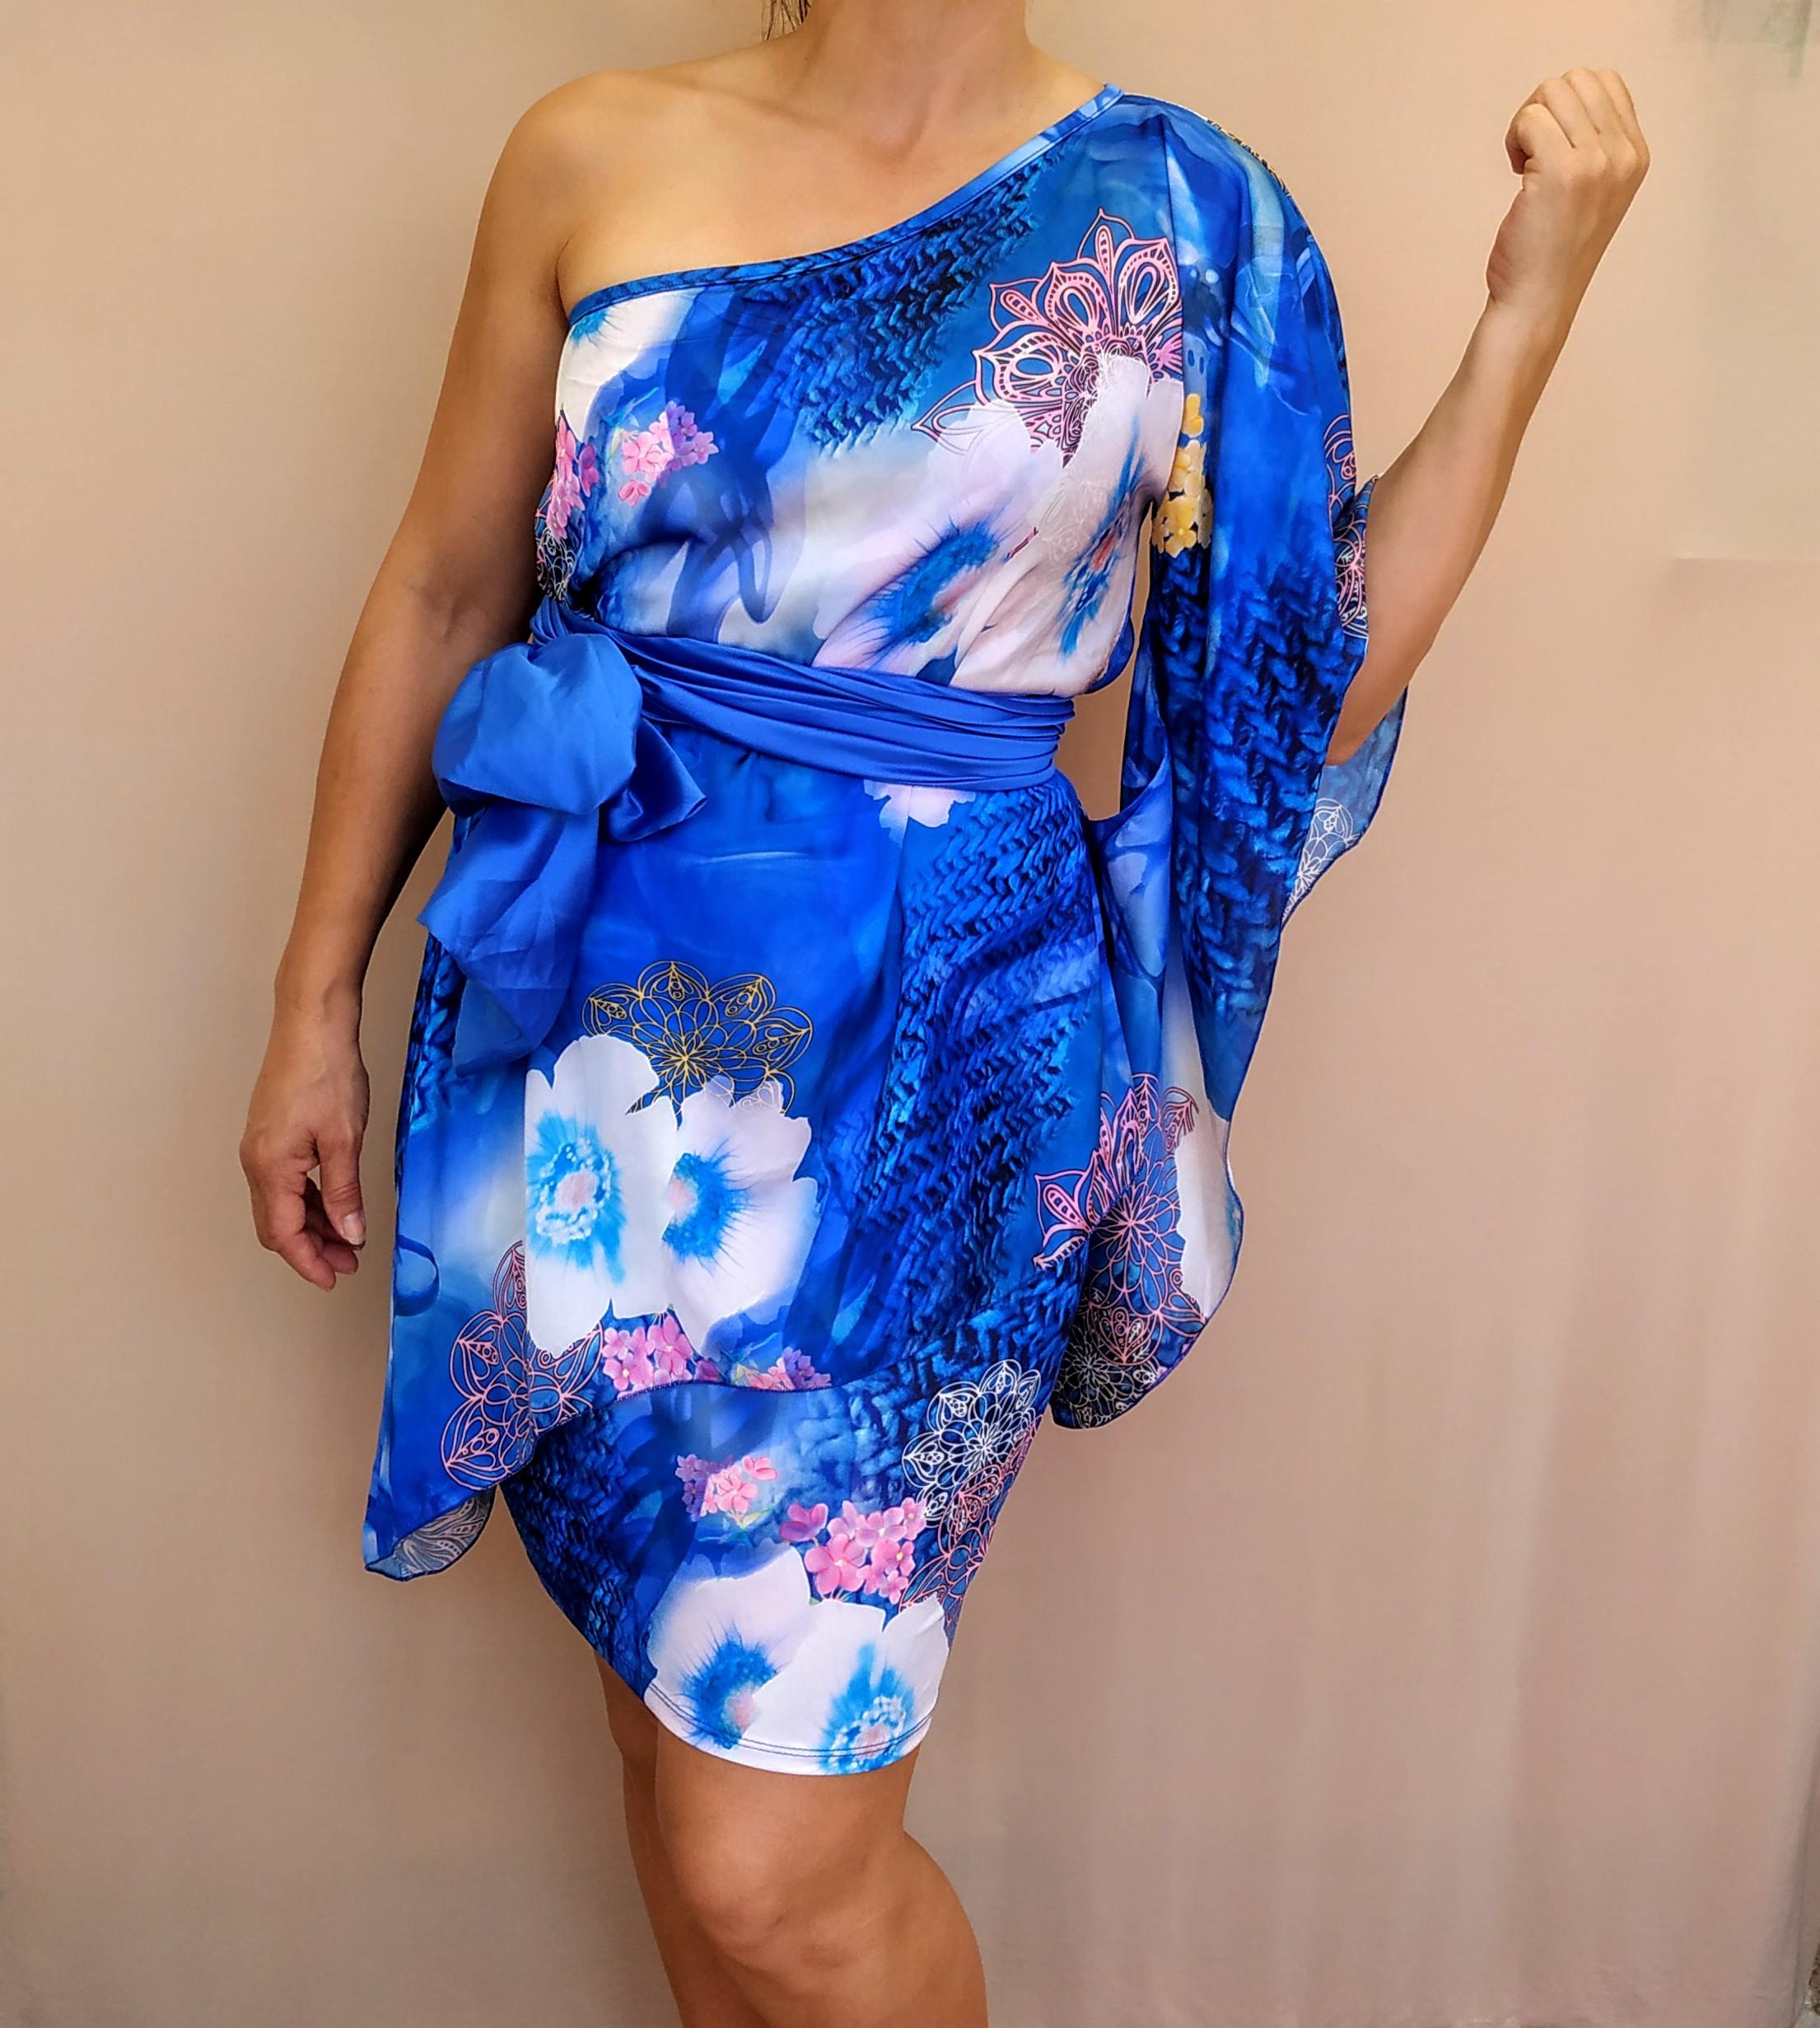 miuma-karina-azul-corto-moda-vestido-cambrils